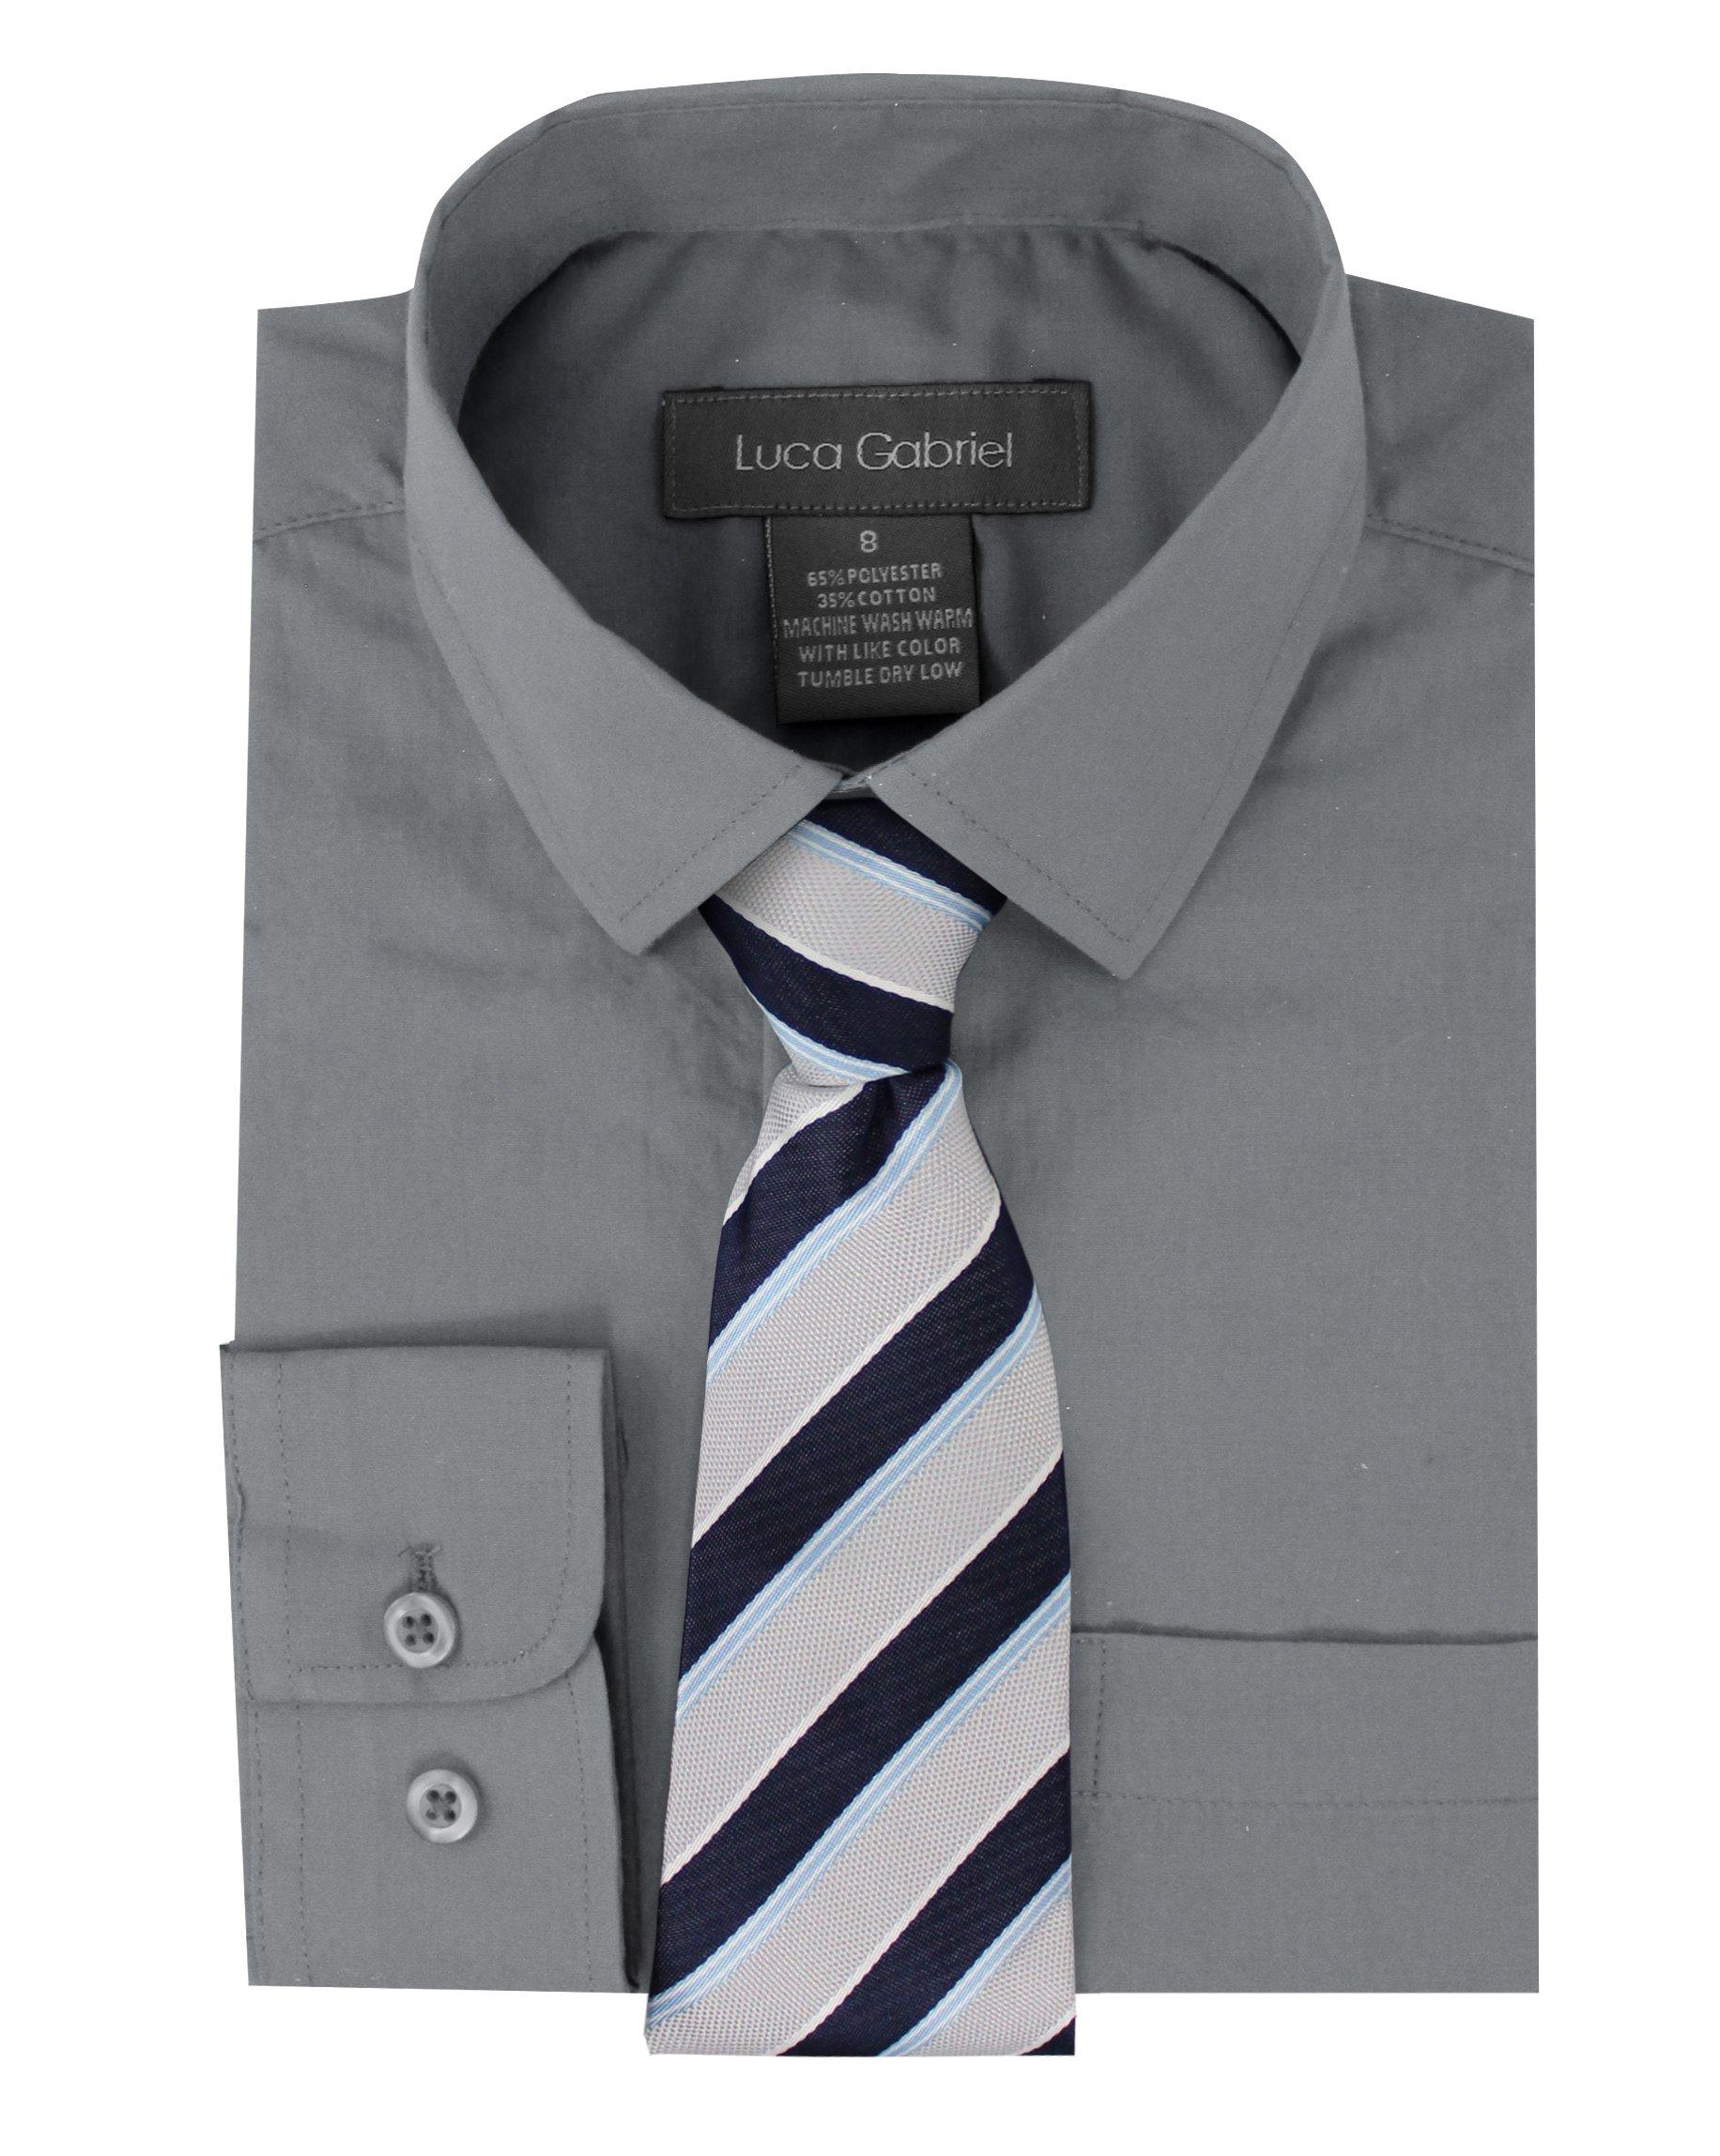 Luca Gabriel Toddler Boy's Long Sleeve Formal Button Down Dress Shirt & Tie Set - Silver Size 10